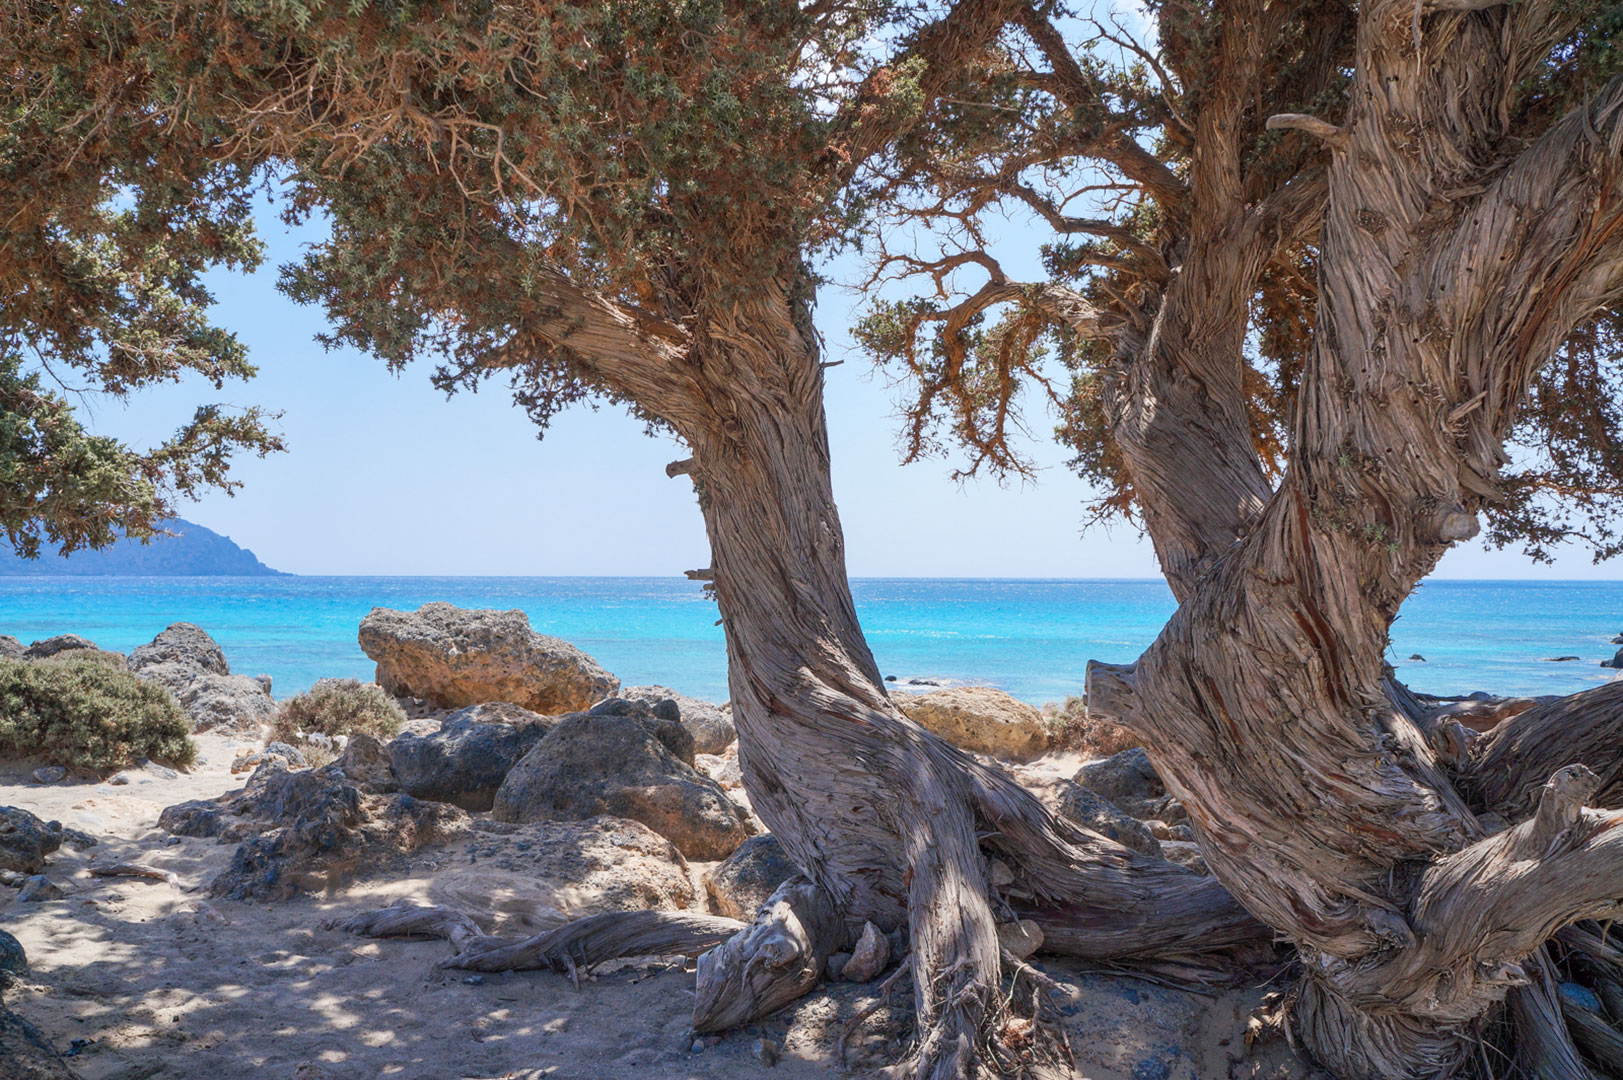 kedrodasos-crete-greece-la-vie-en-blog-all-rights-reserved-24